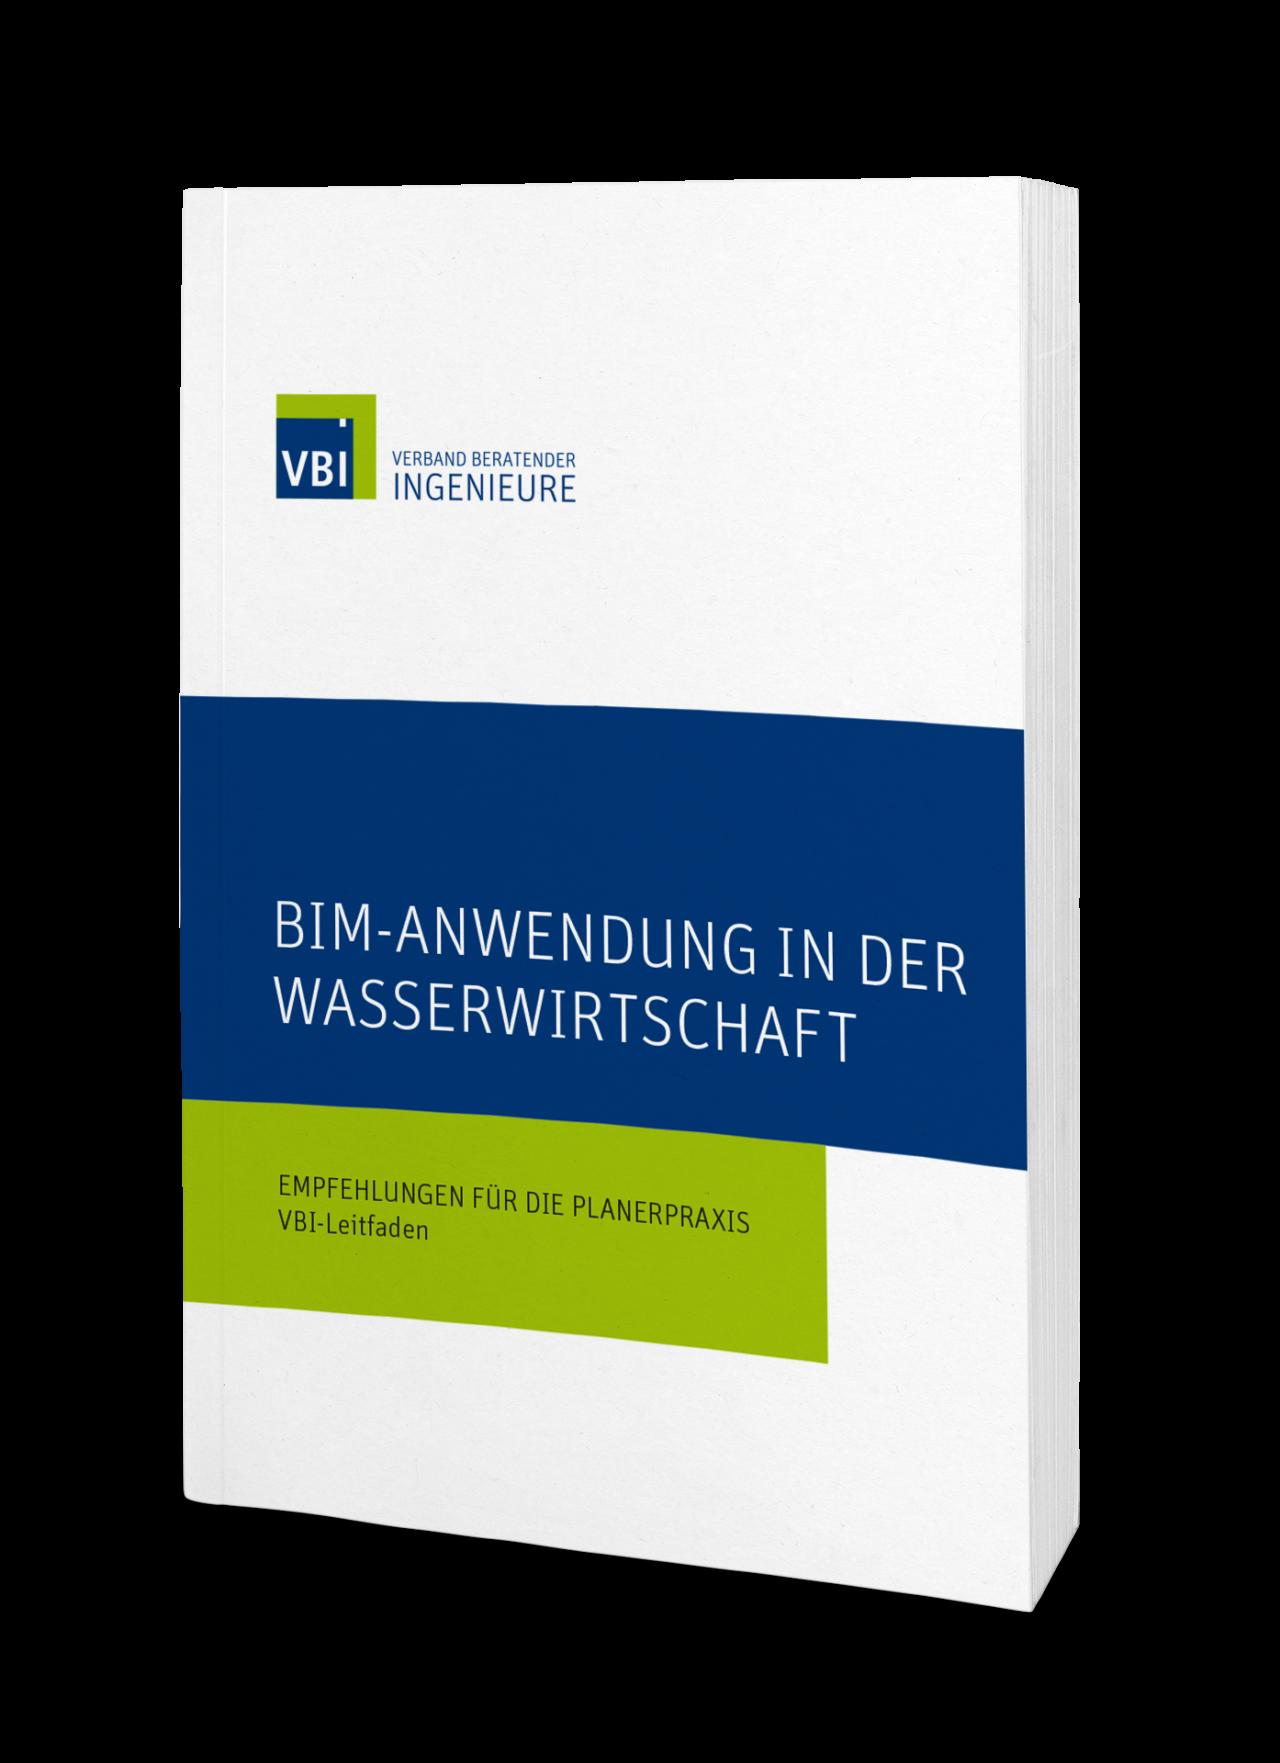 Cover der VBI-Broschüre